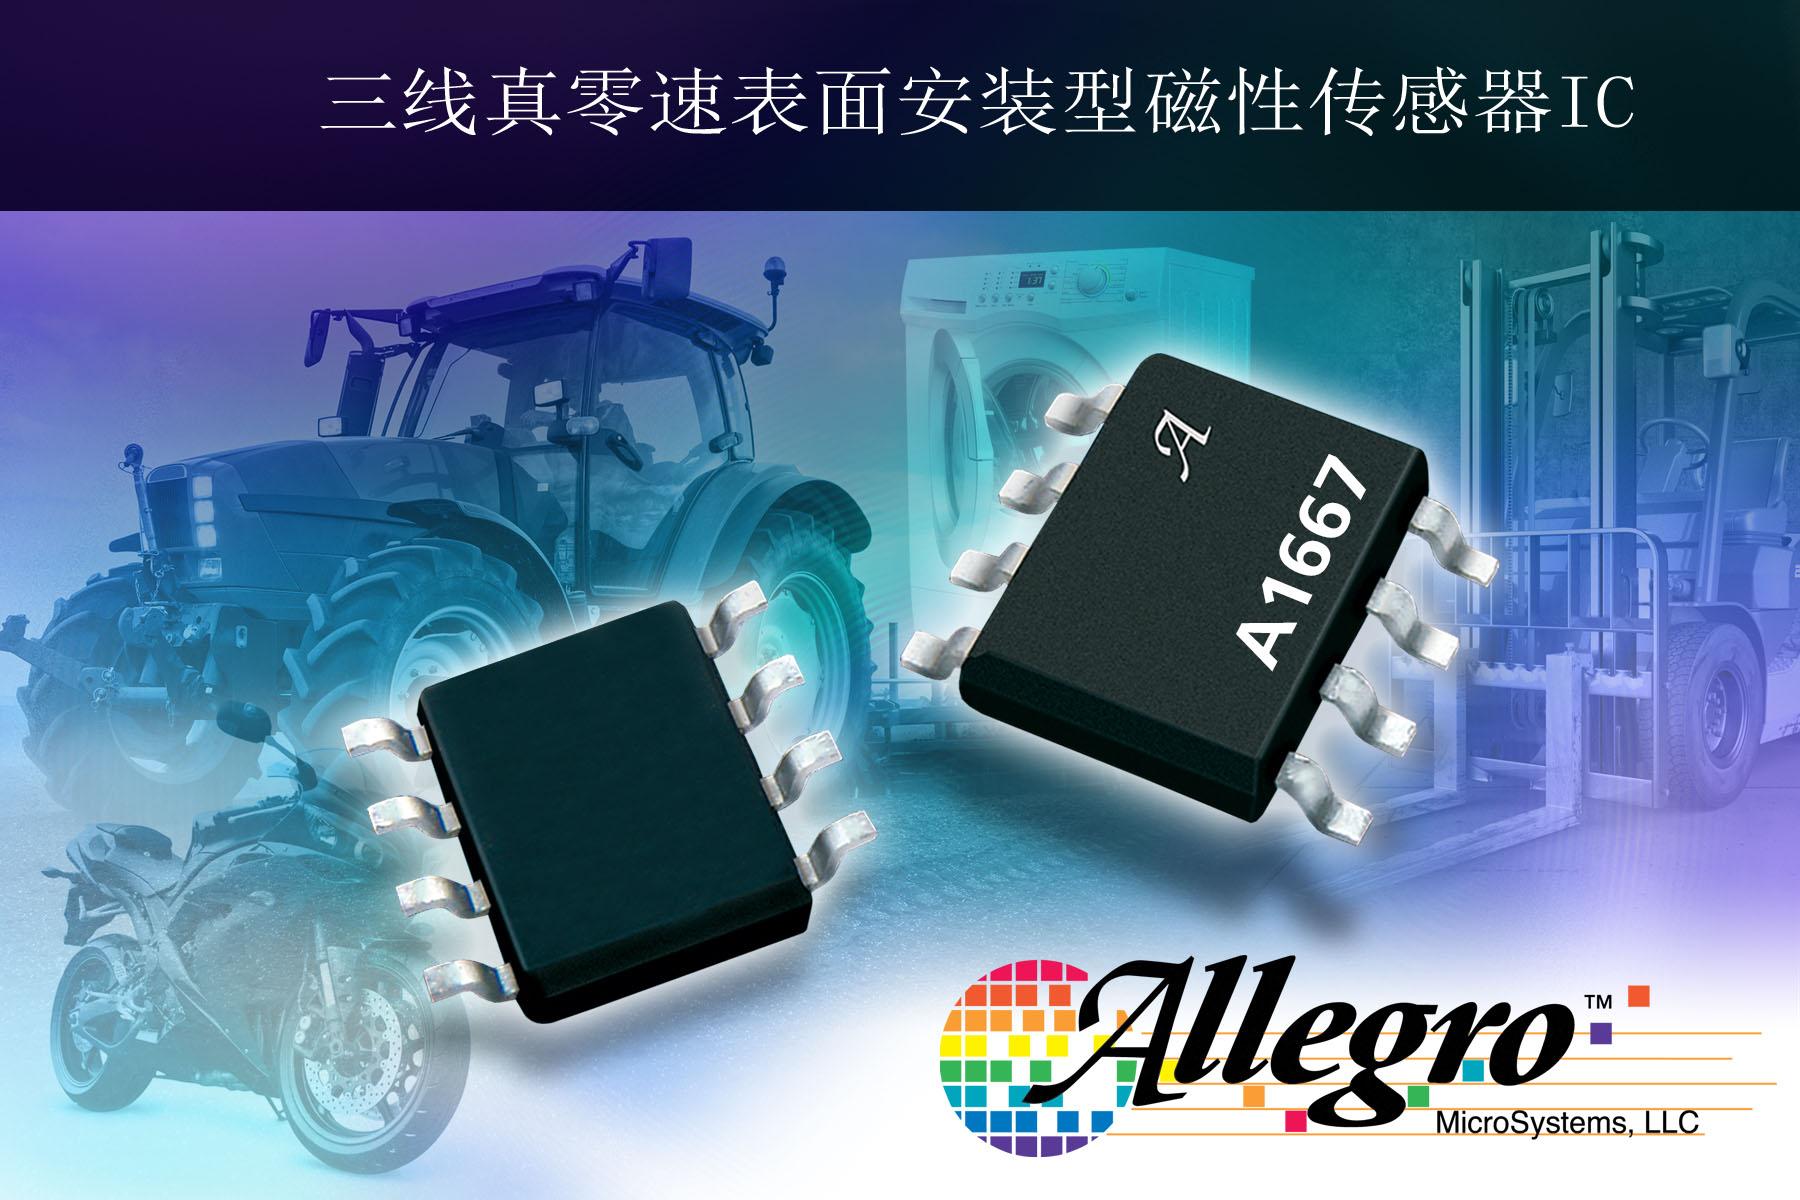 Allegro MicroSystems, LLC发布全新三线真零速磁性速度传感器IC